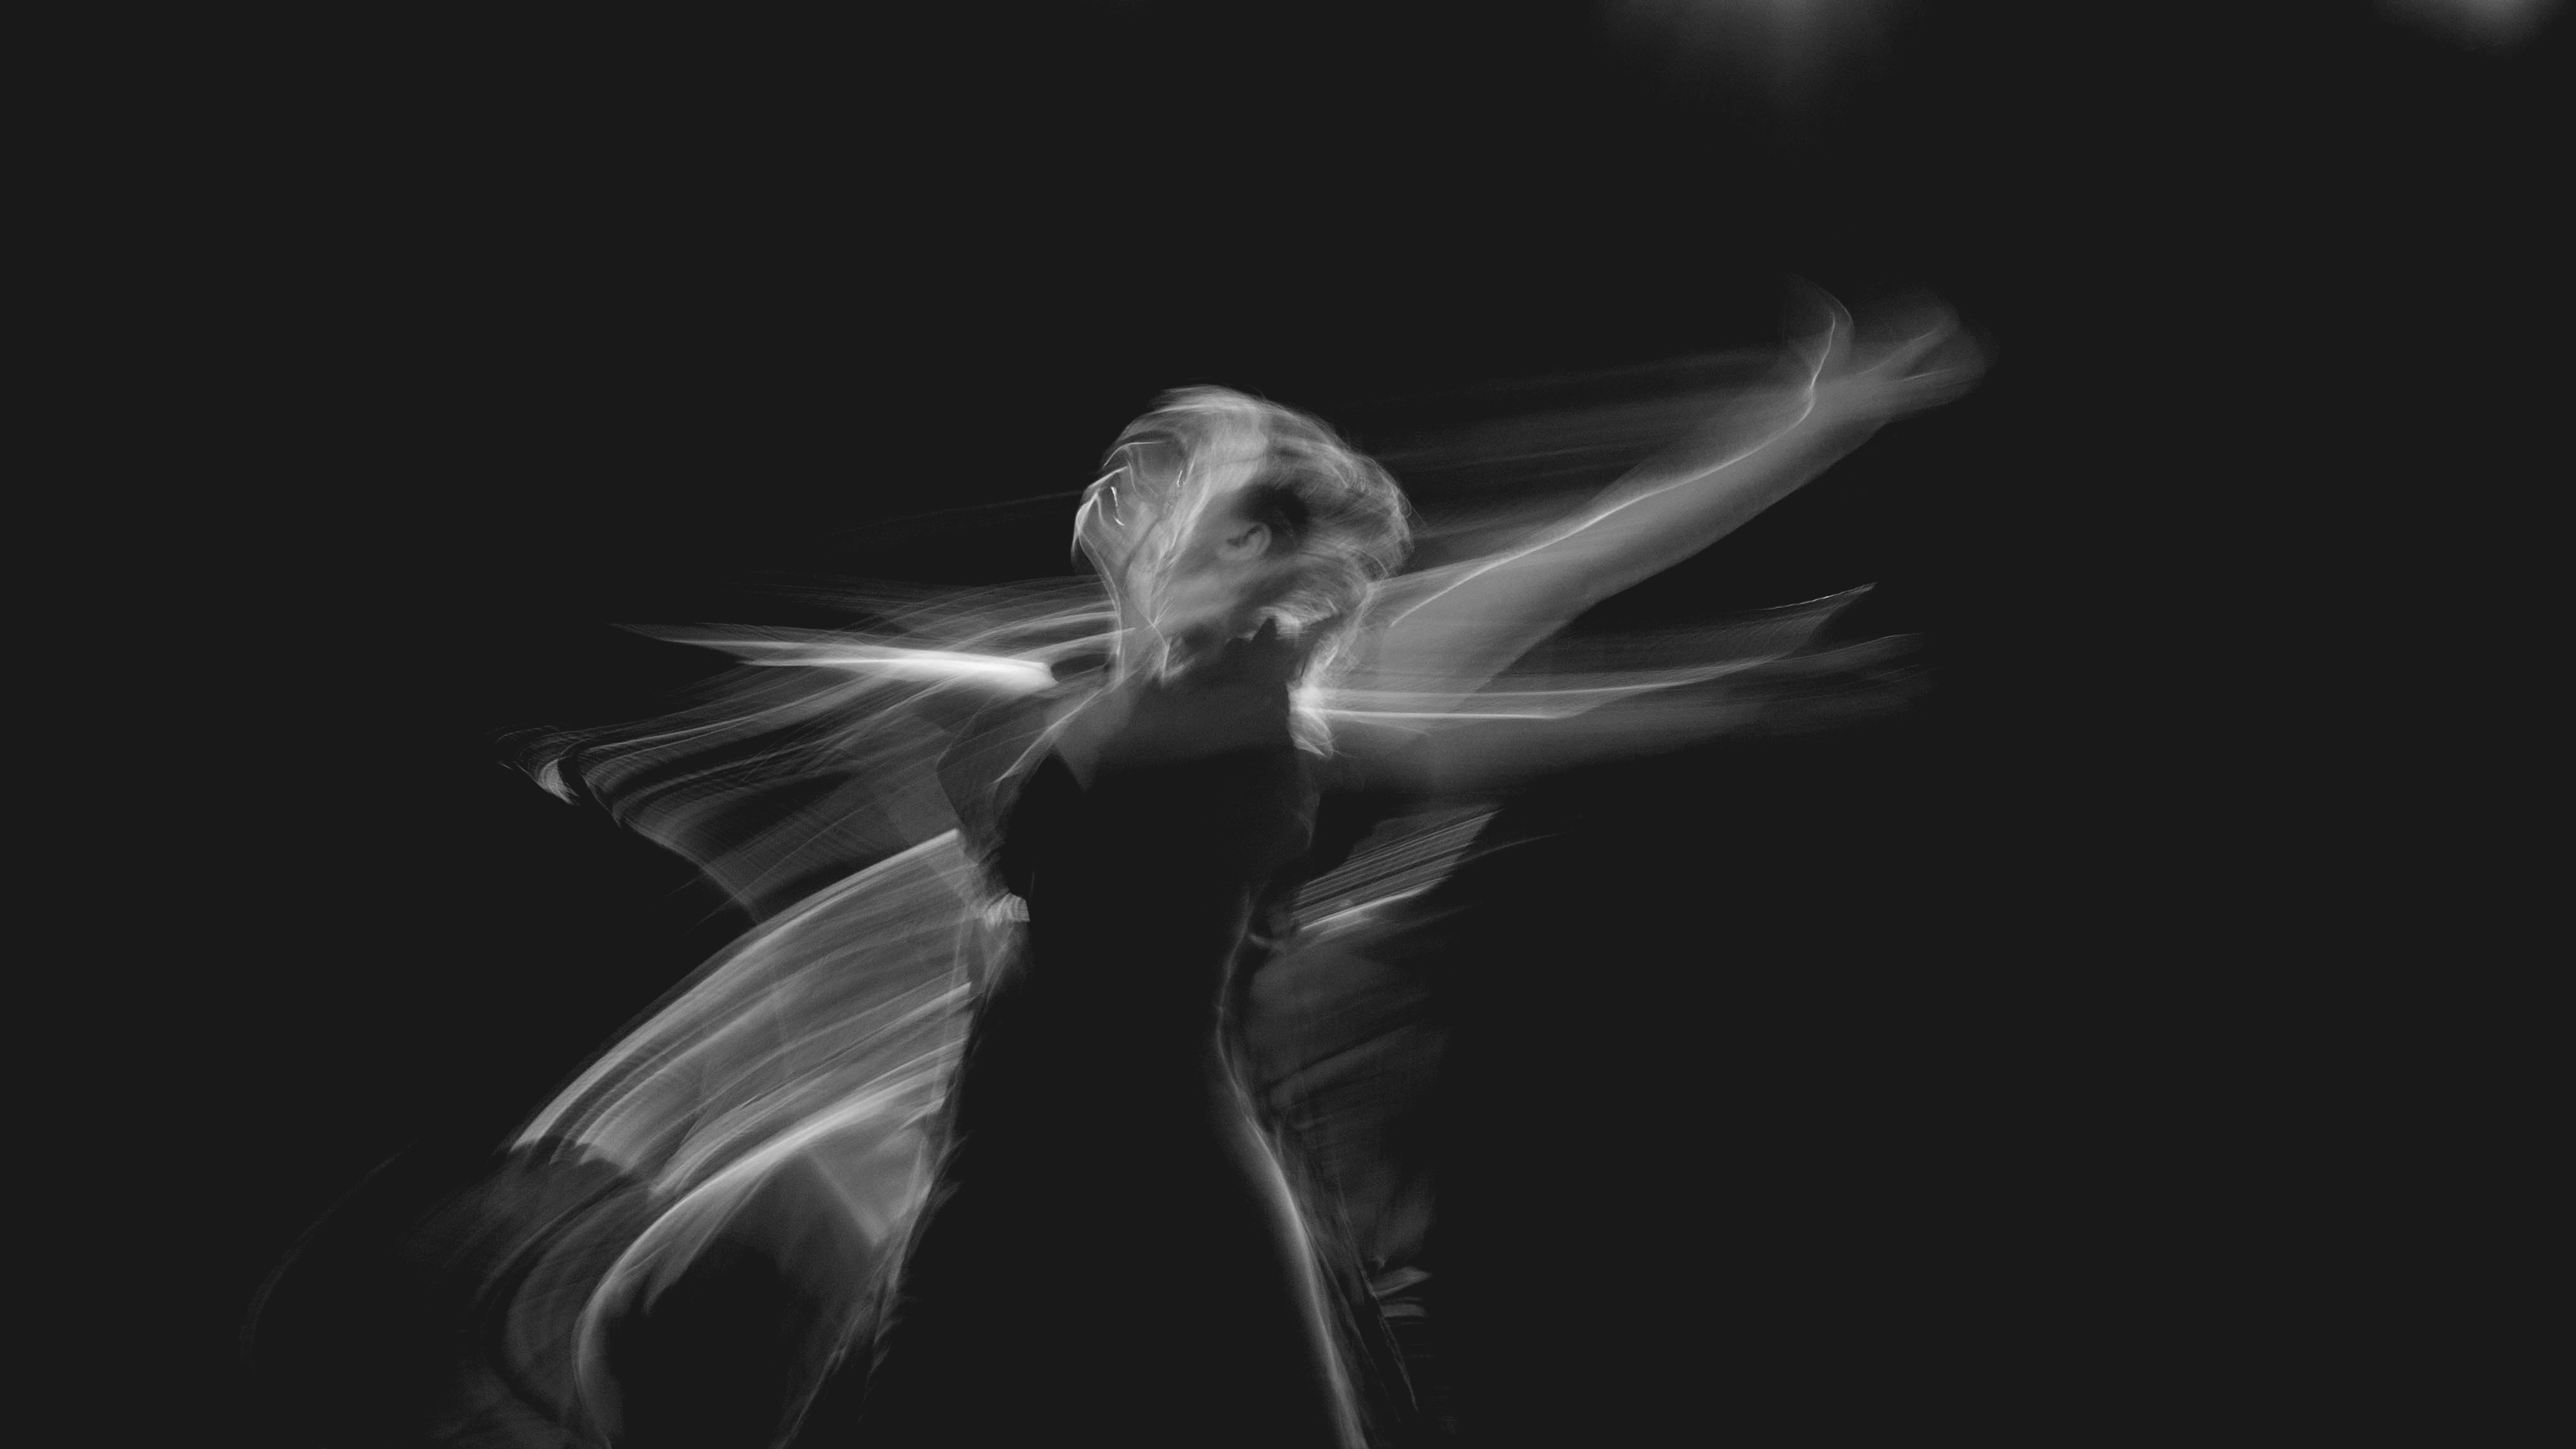 dance-low-shutter